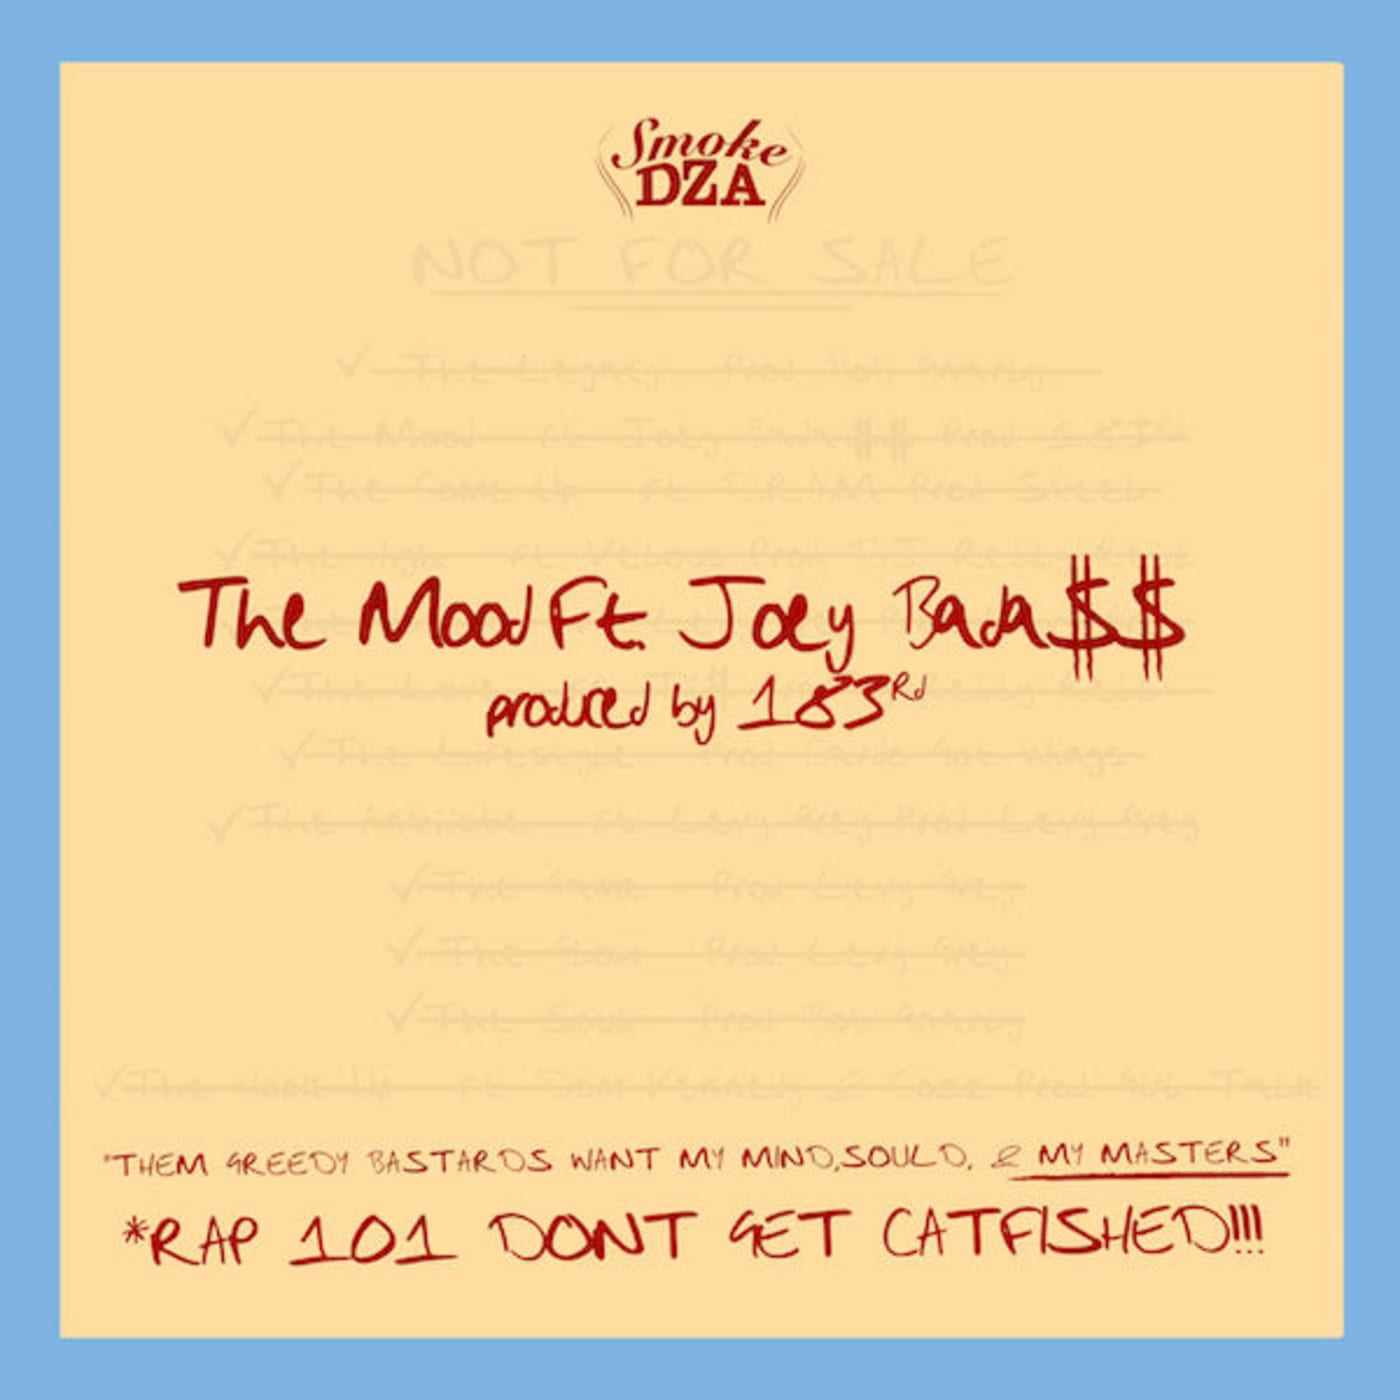 DZA Joey The Mood